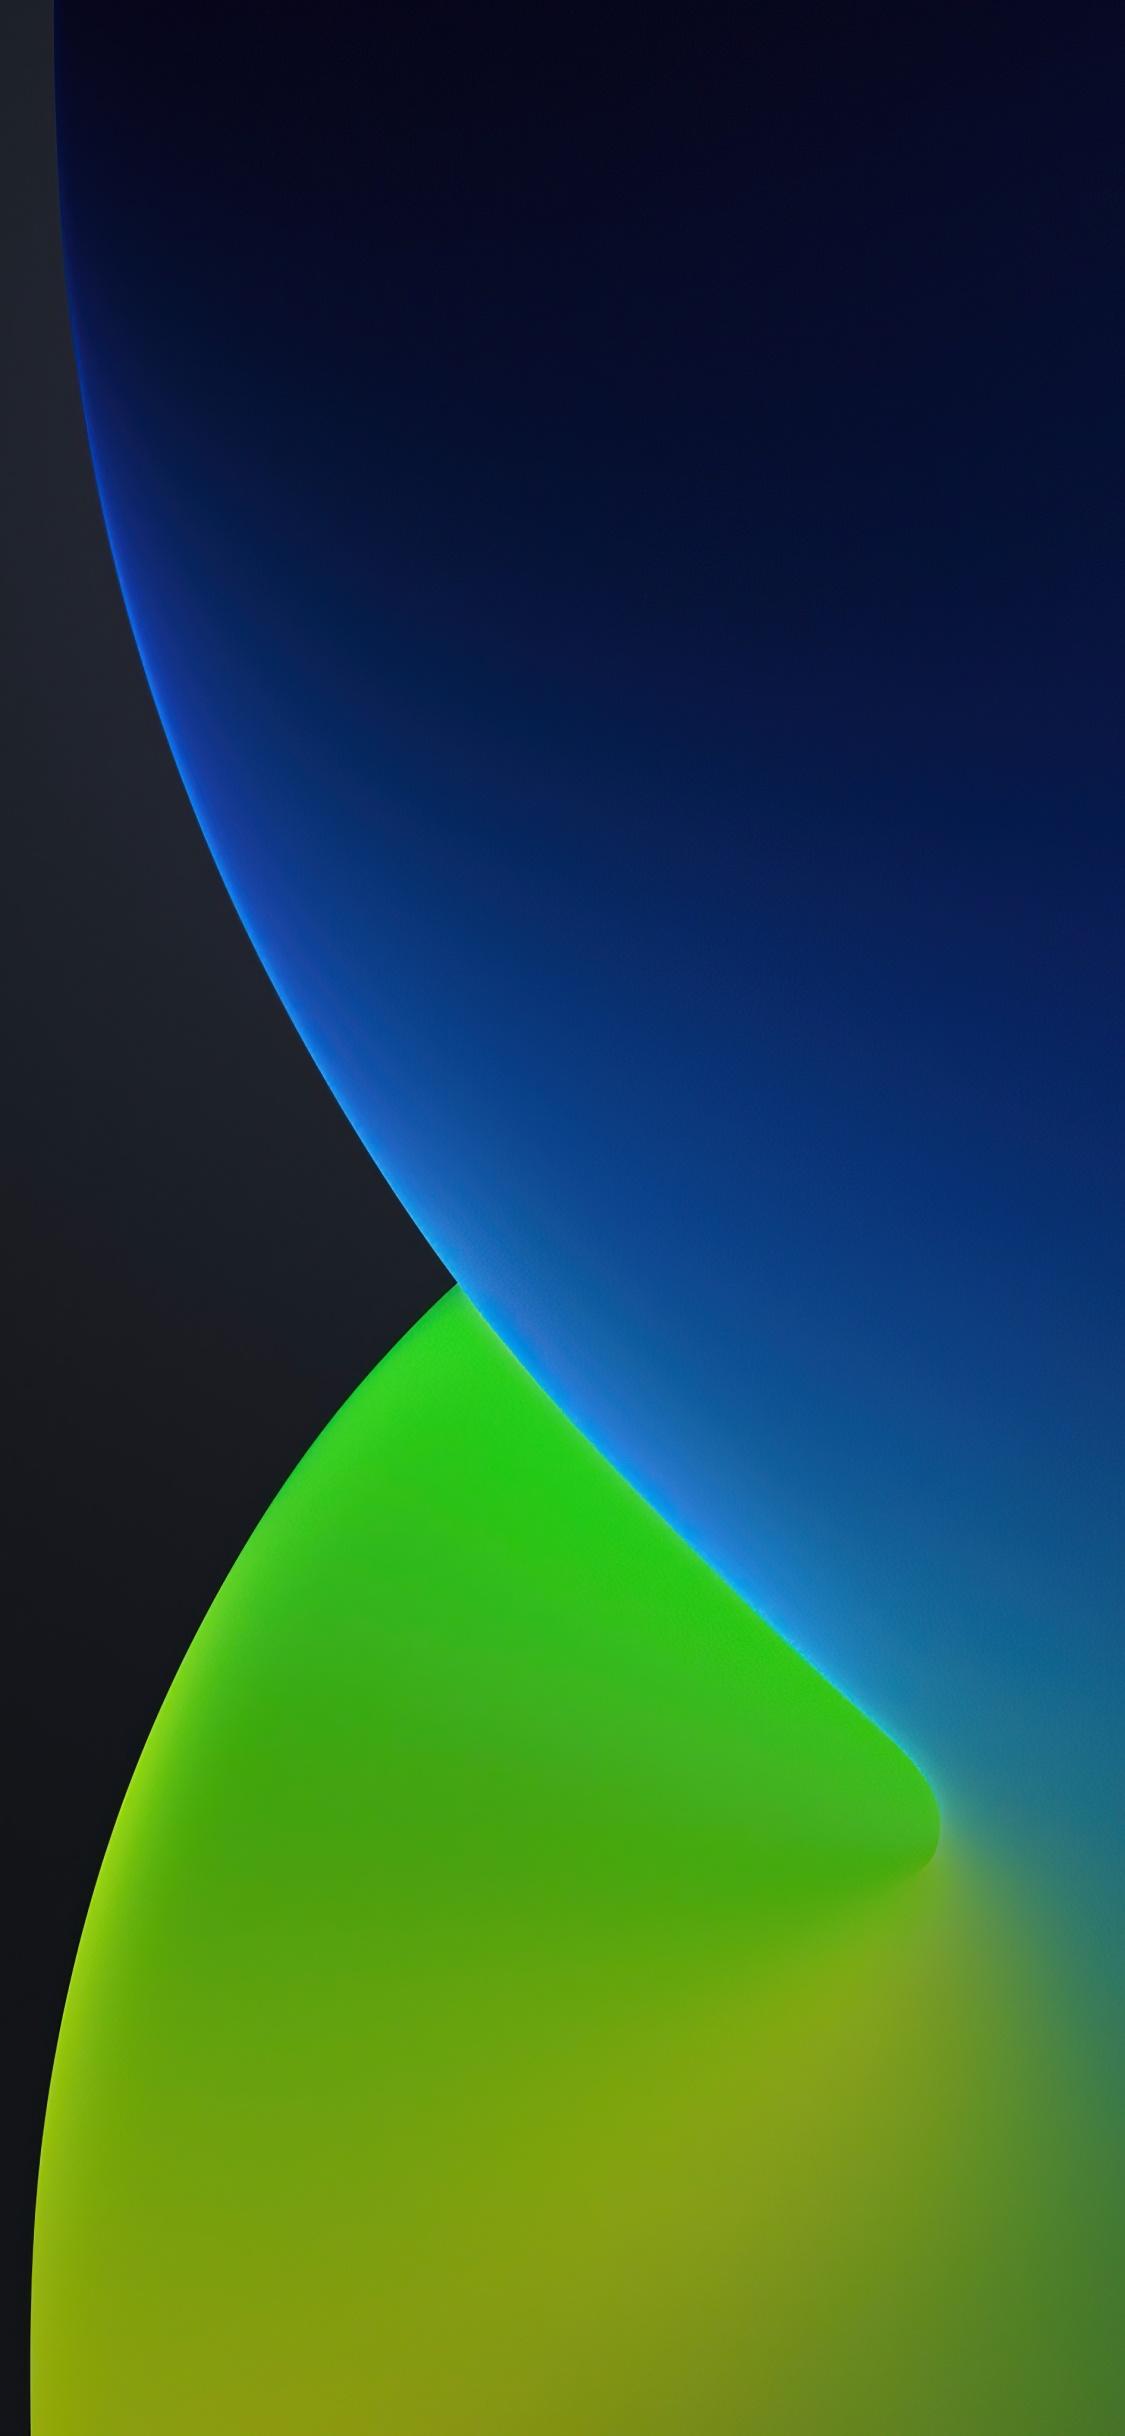 Ios 14 4k Wallpaper Wwdc 2020 Iphone 12 Ipados Dark Green Blue Stock Gradients 1442